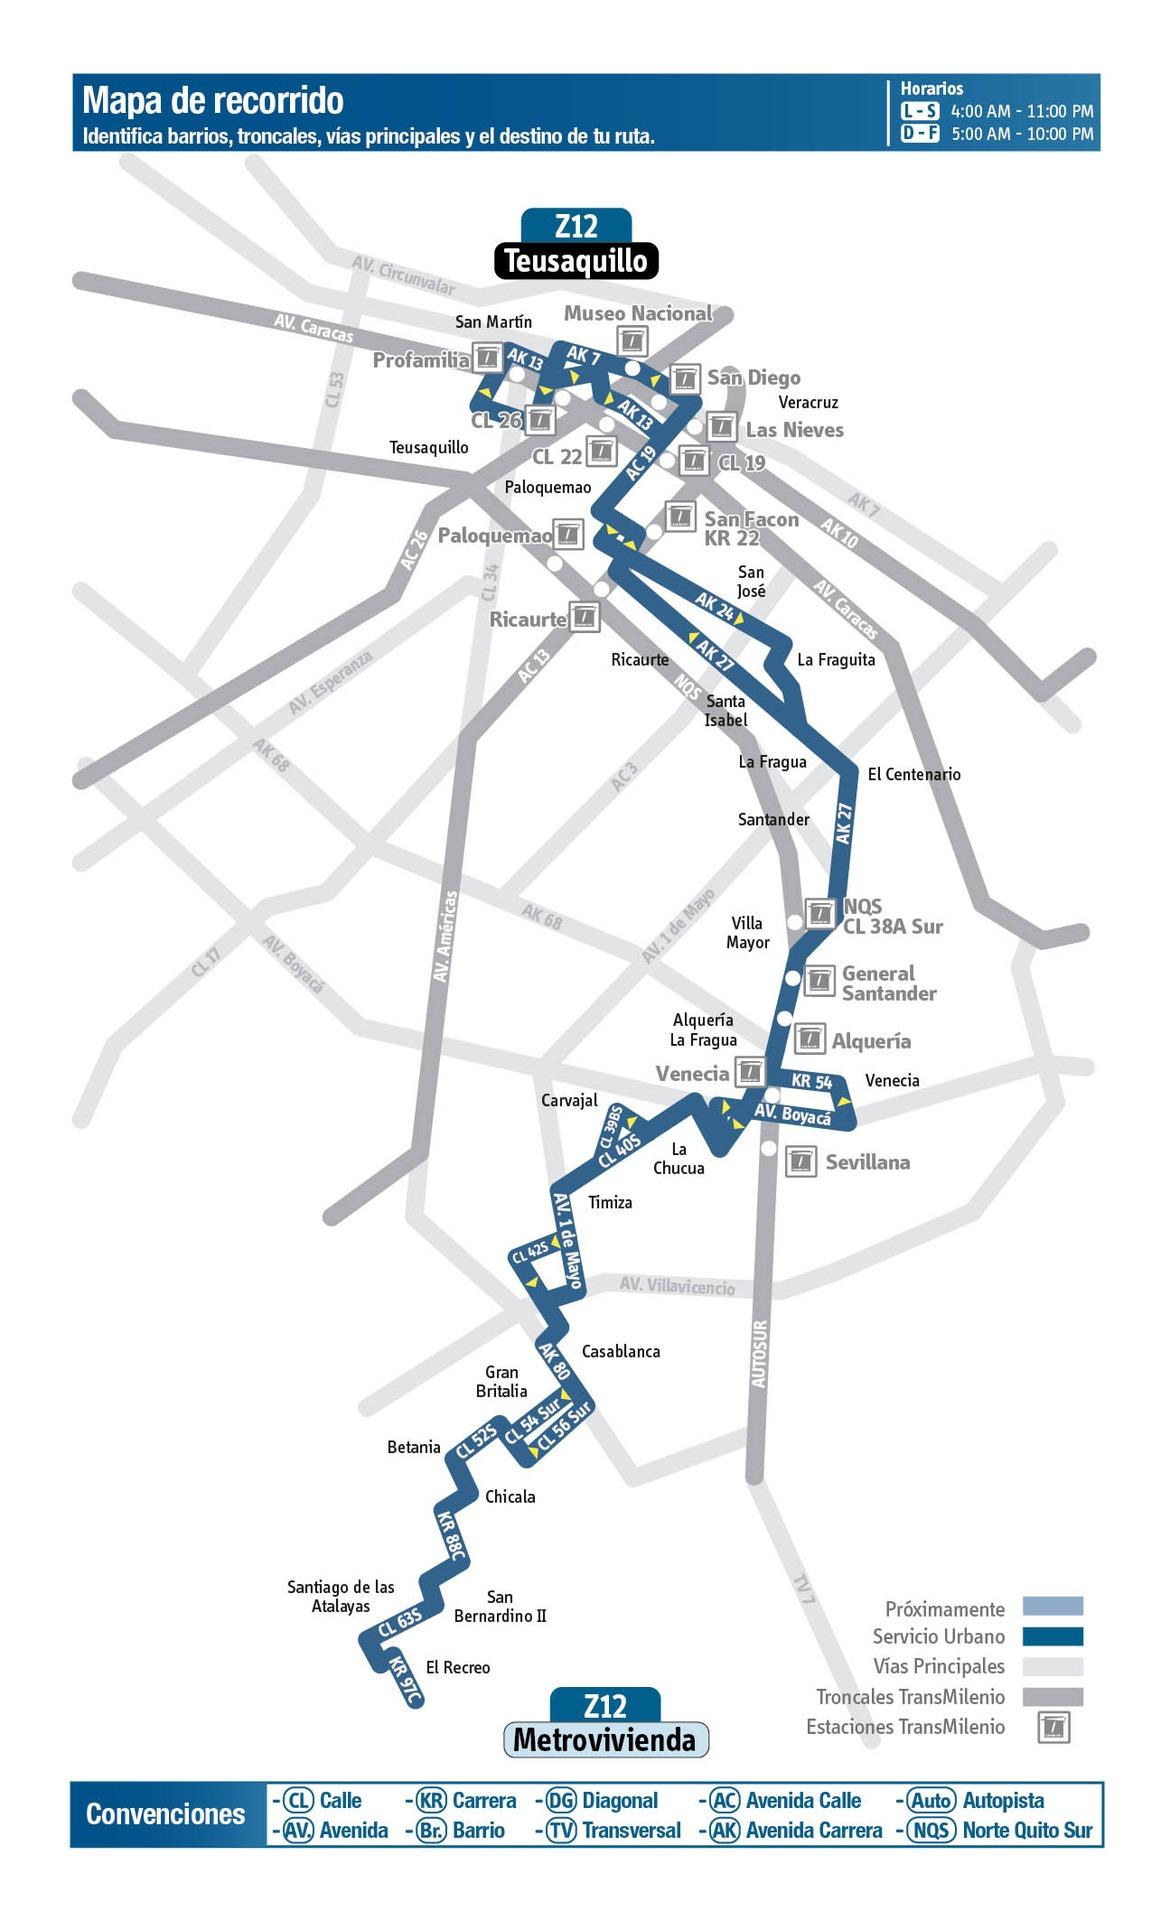 Ruta SITP: Z12 Metrovivienda ↔ Teusaquillo [Urbana] 2